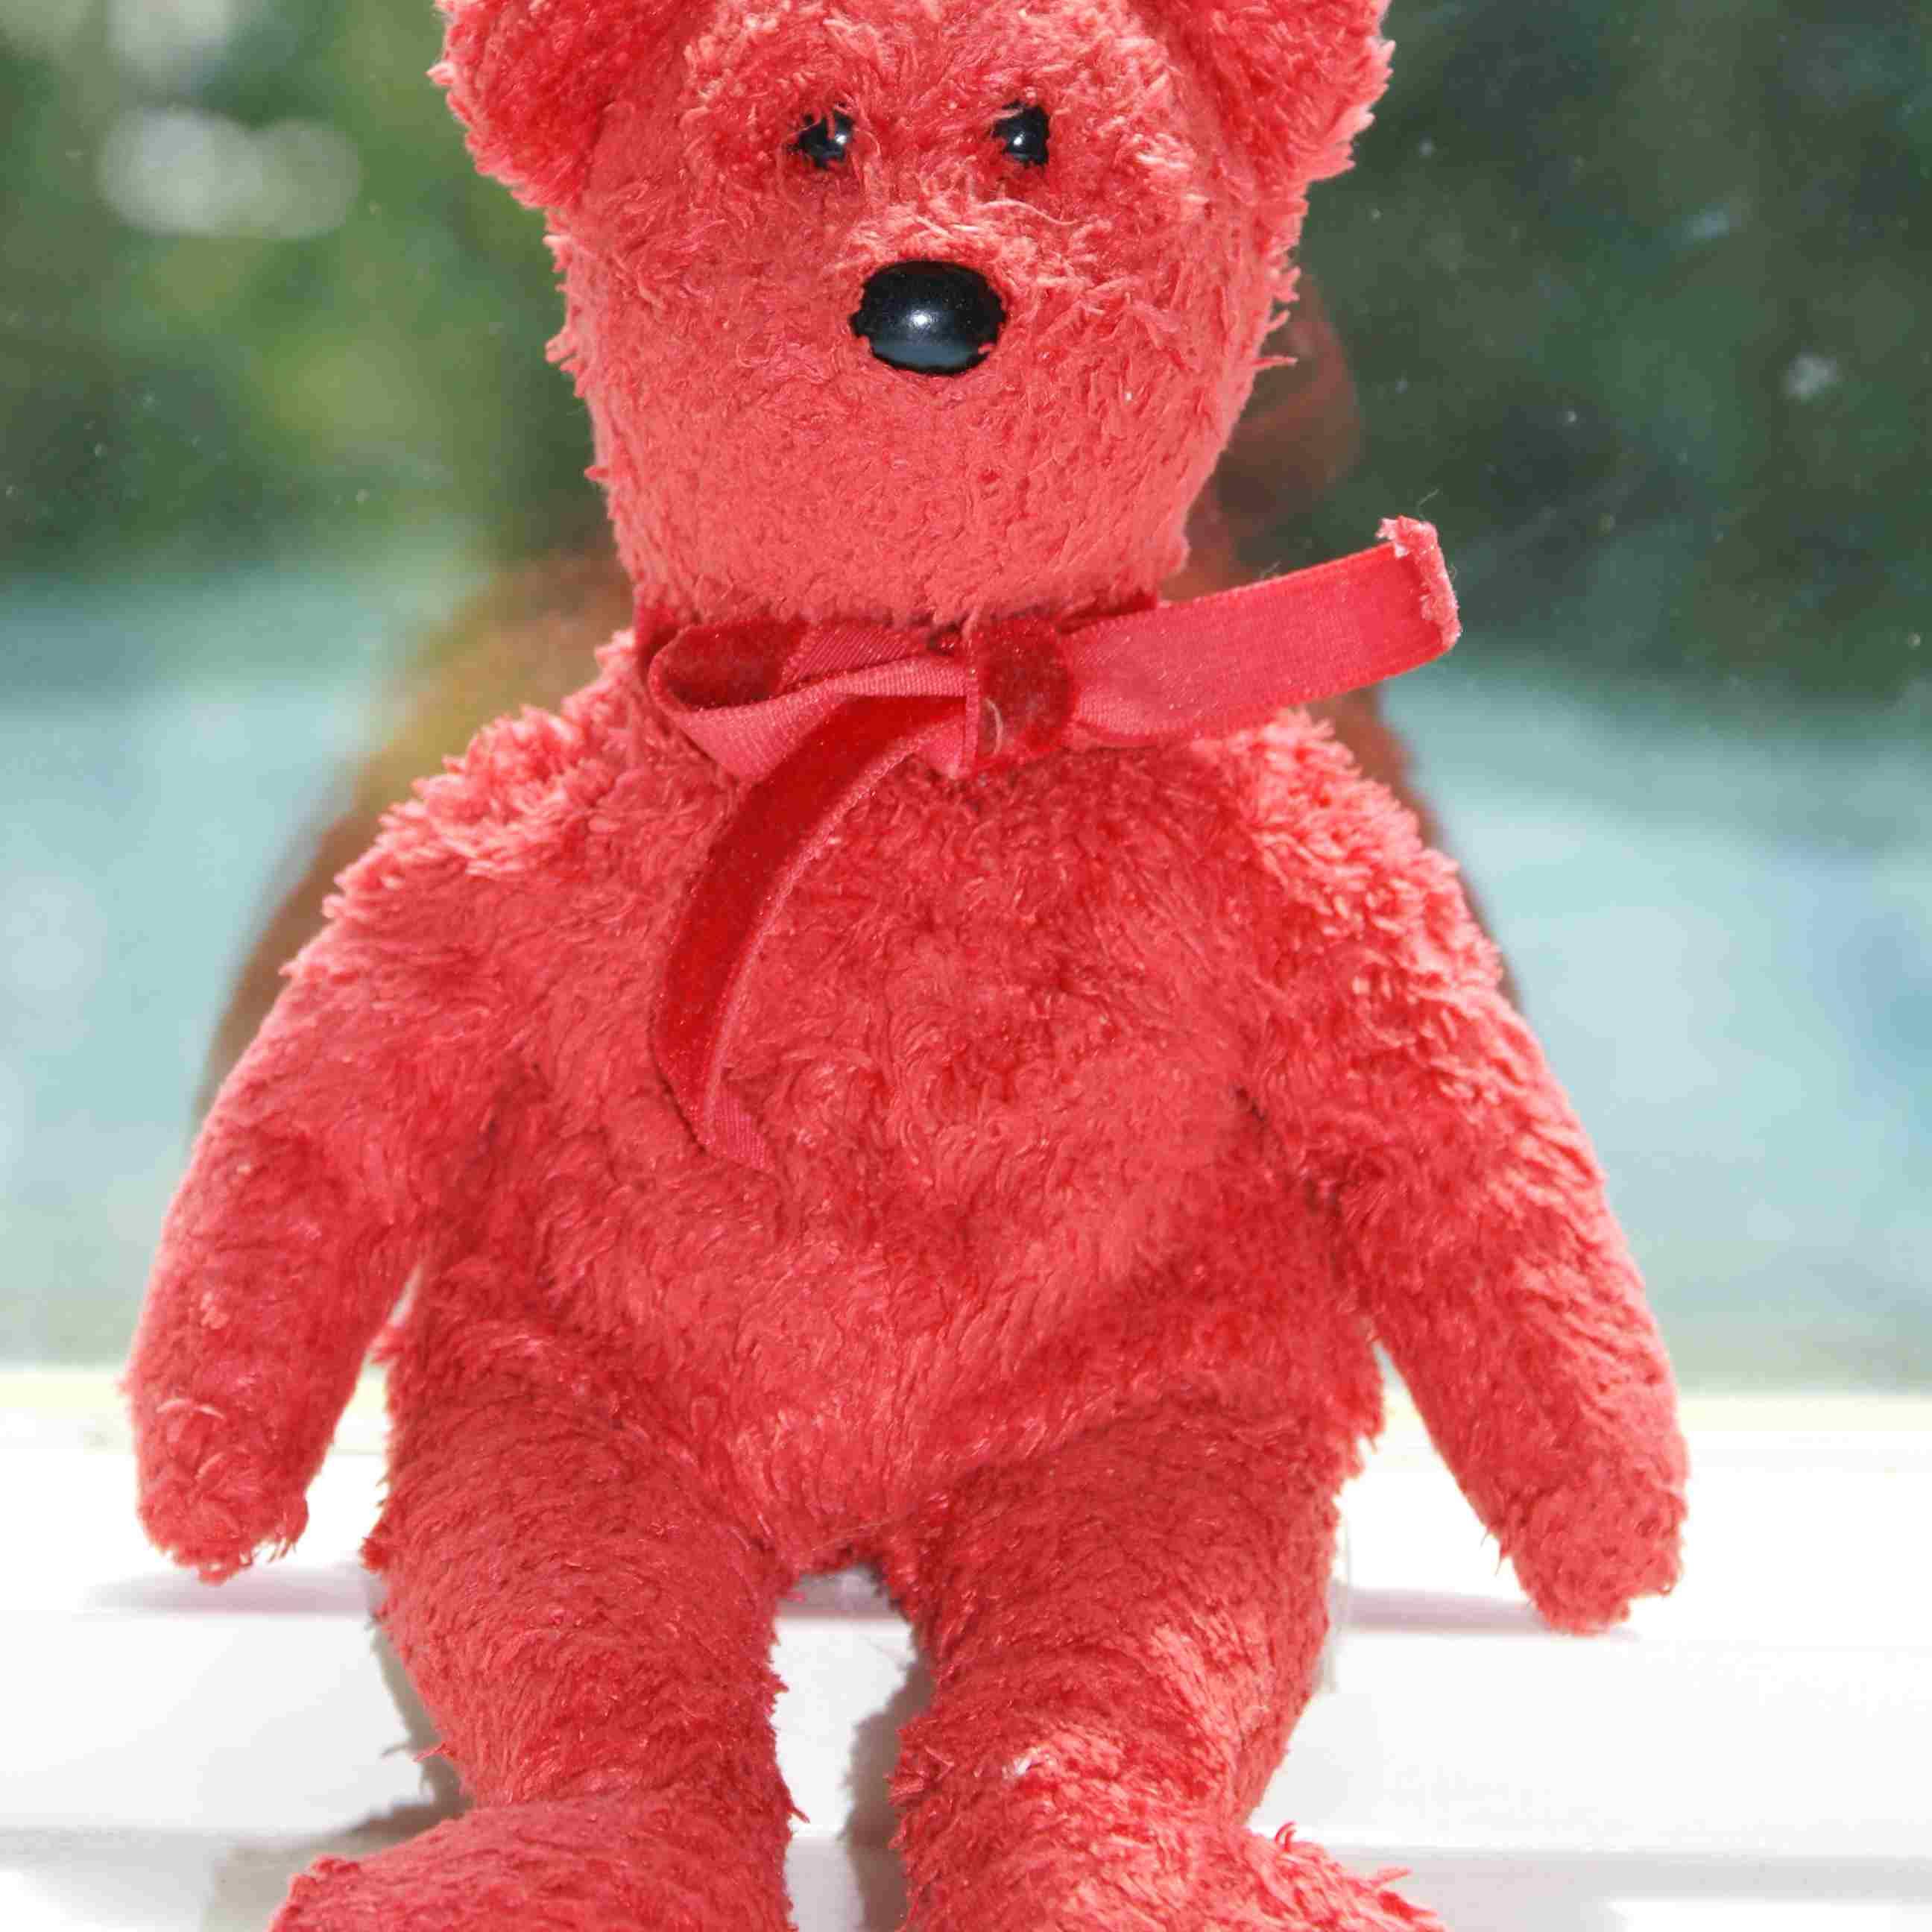 Red Beanie Baby bear